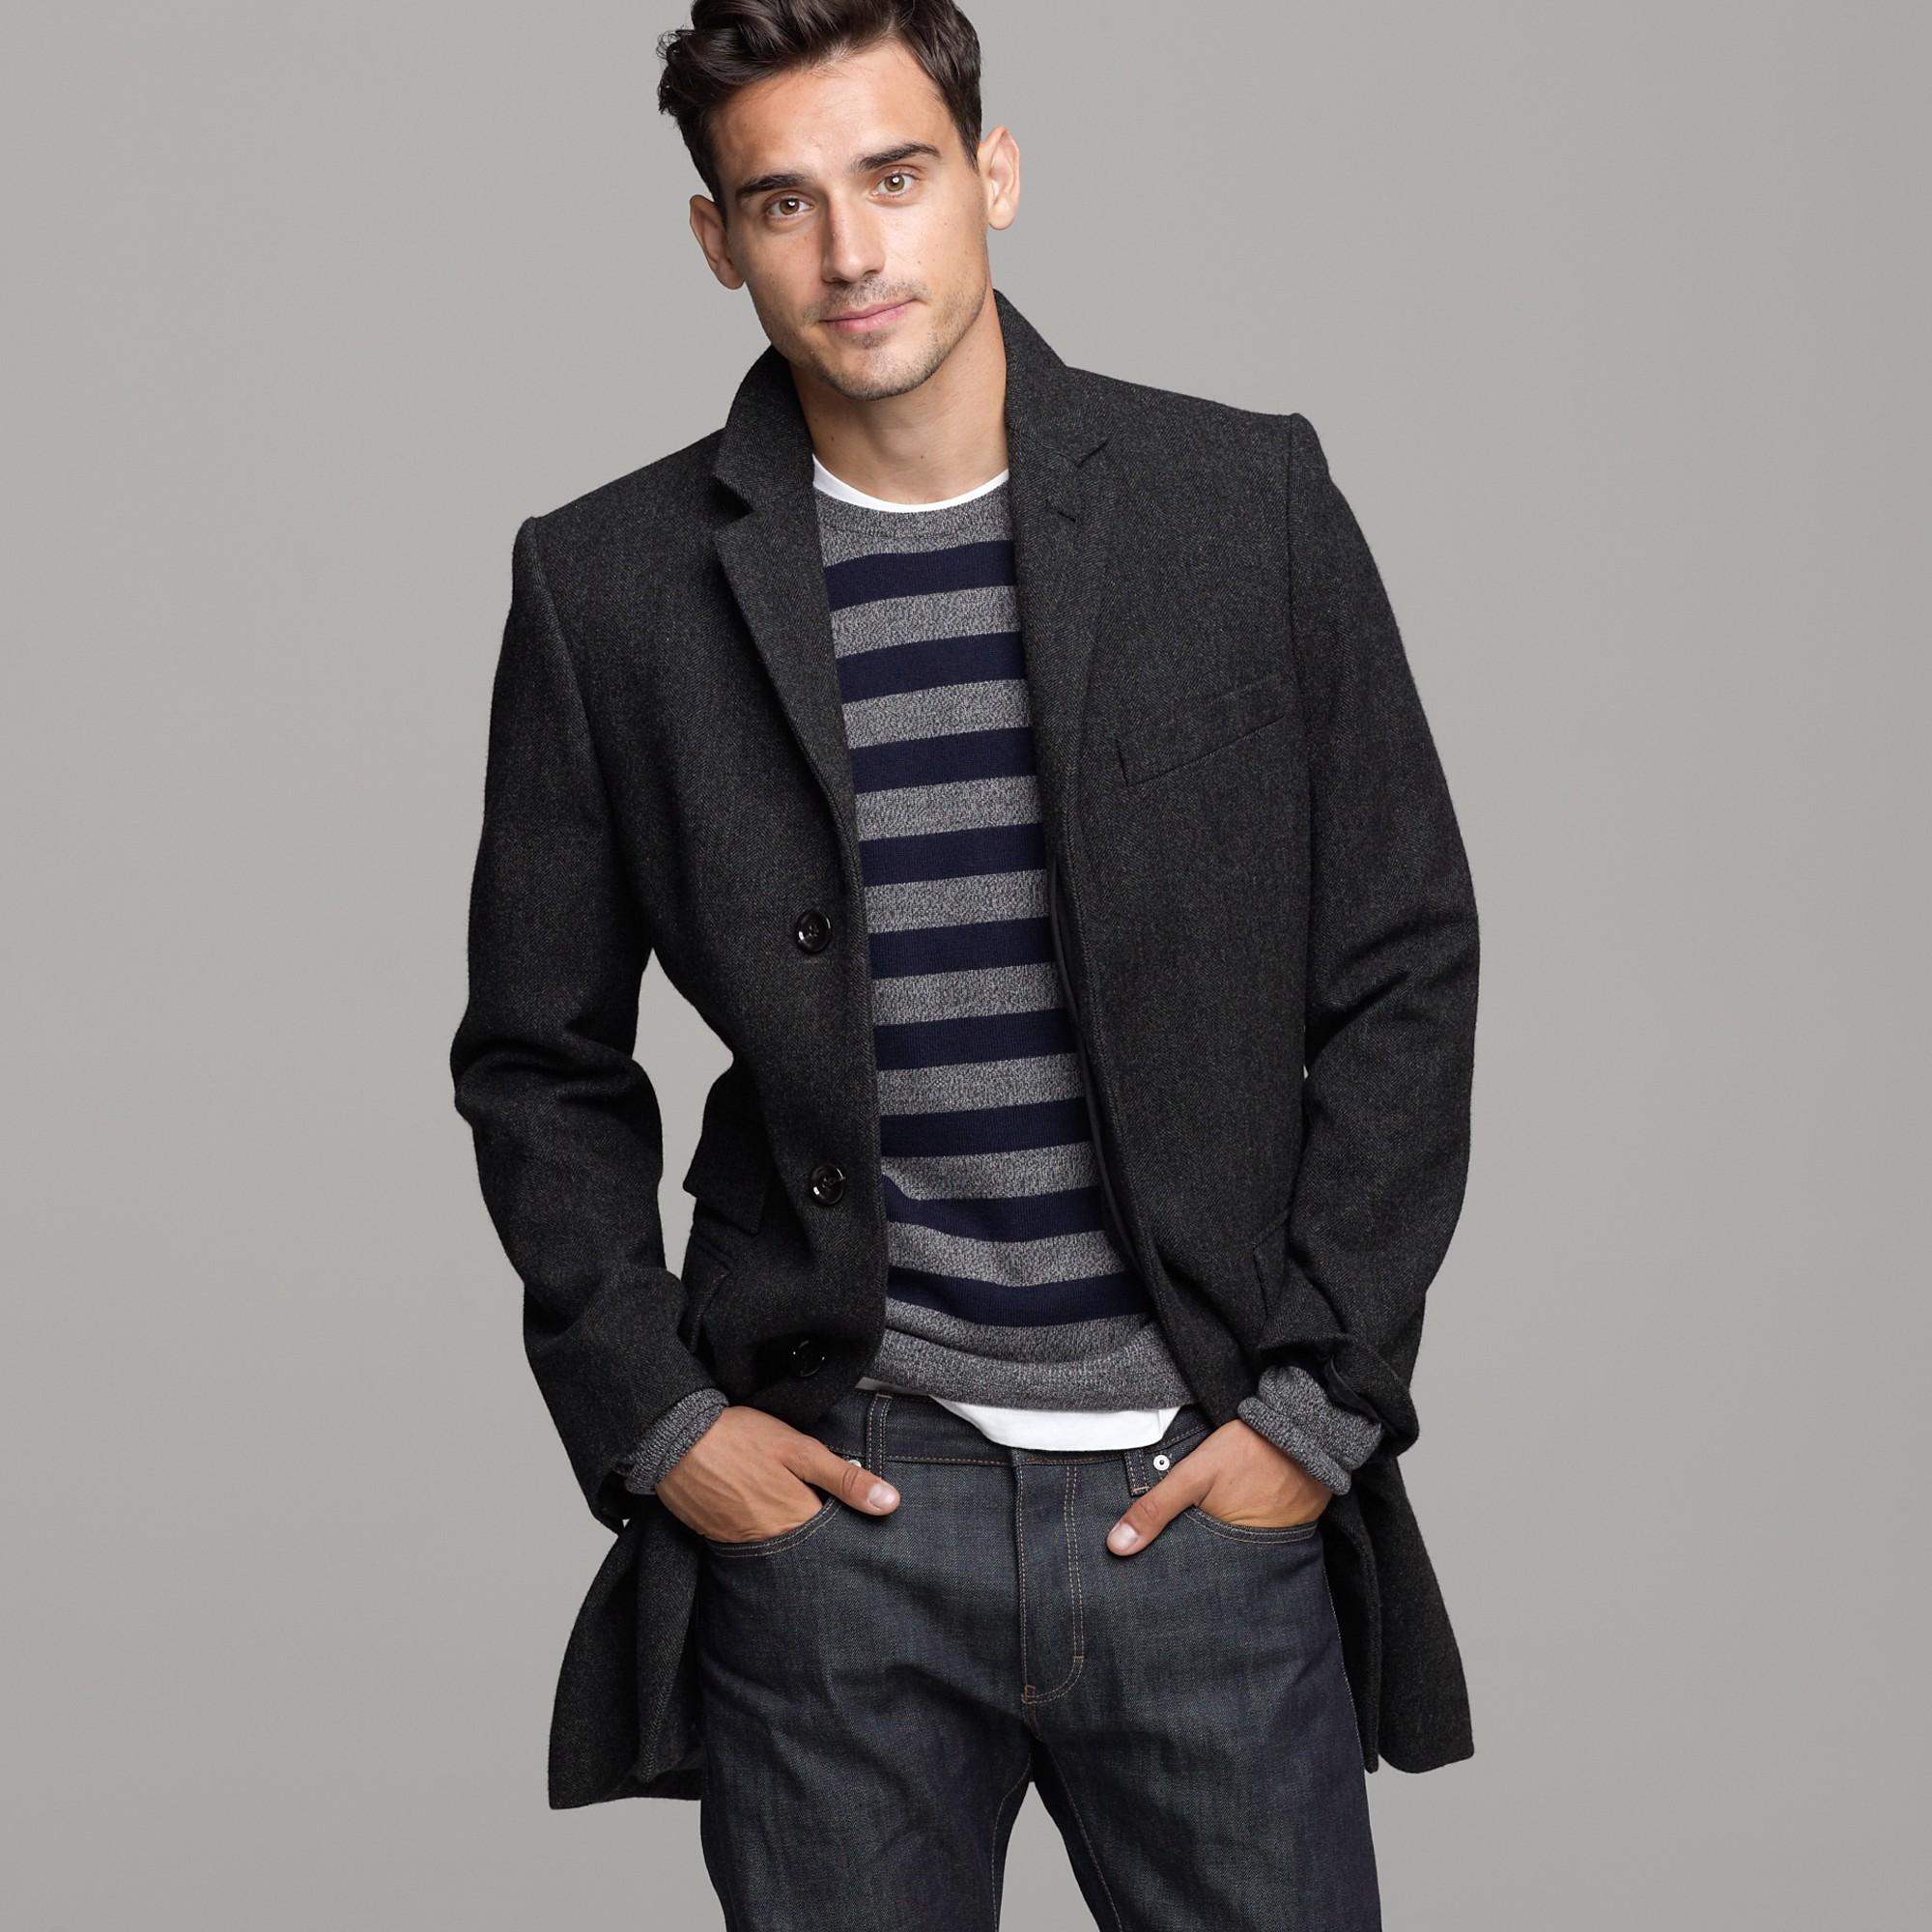 The Top 10 Stylish Most Men, Ji eun big stylish bang